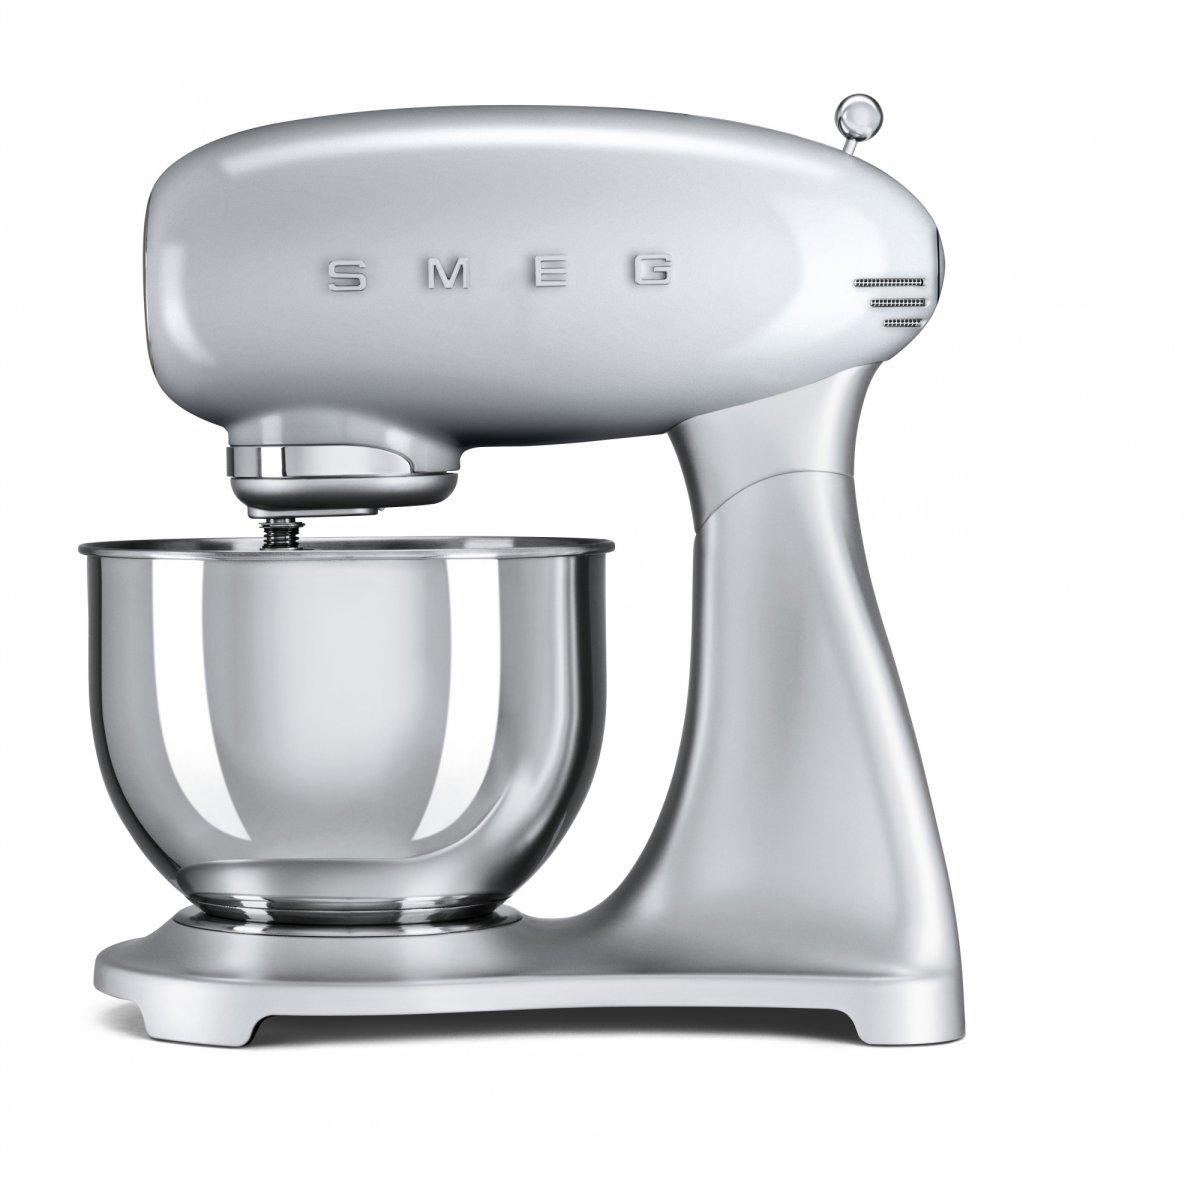 SMEG Küchenmaschine POLARSILBER METALLIC SMF01SVEU